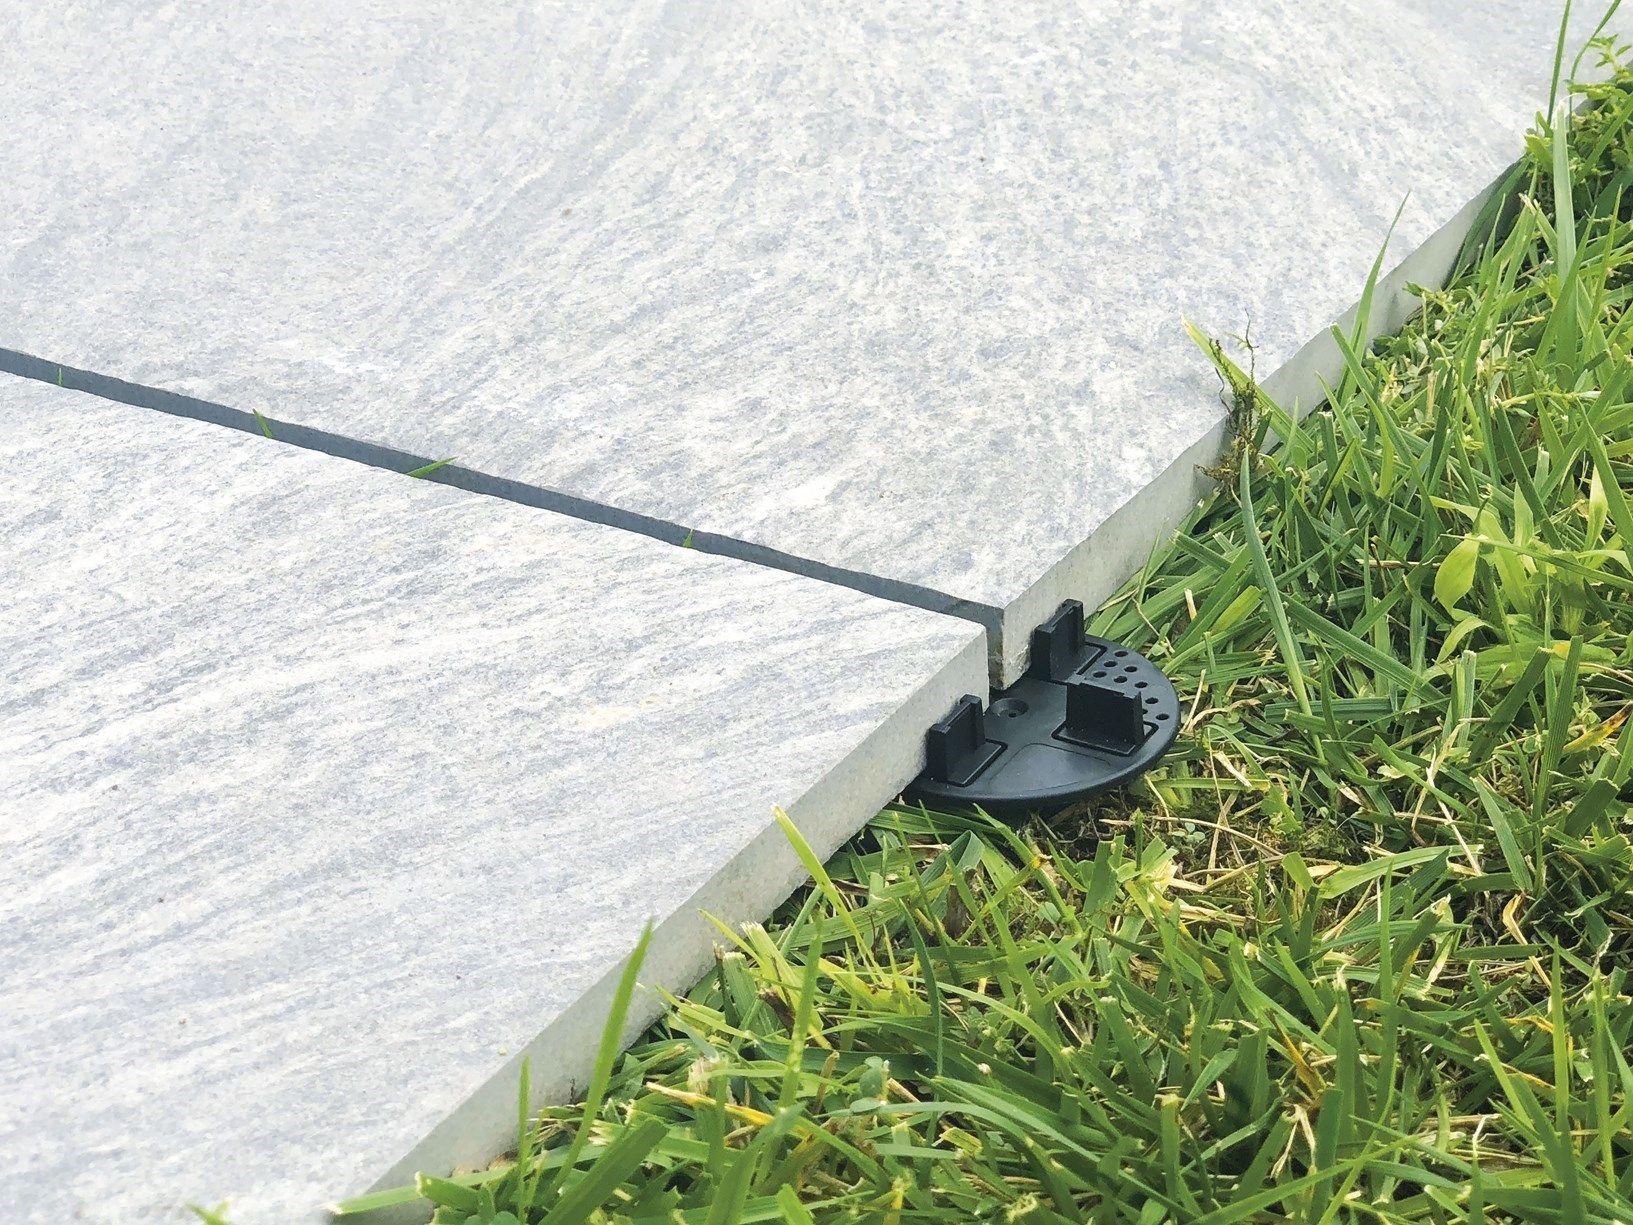 Impertek per le pavimentazioni esterne sopraelevate